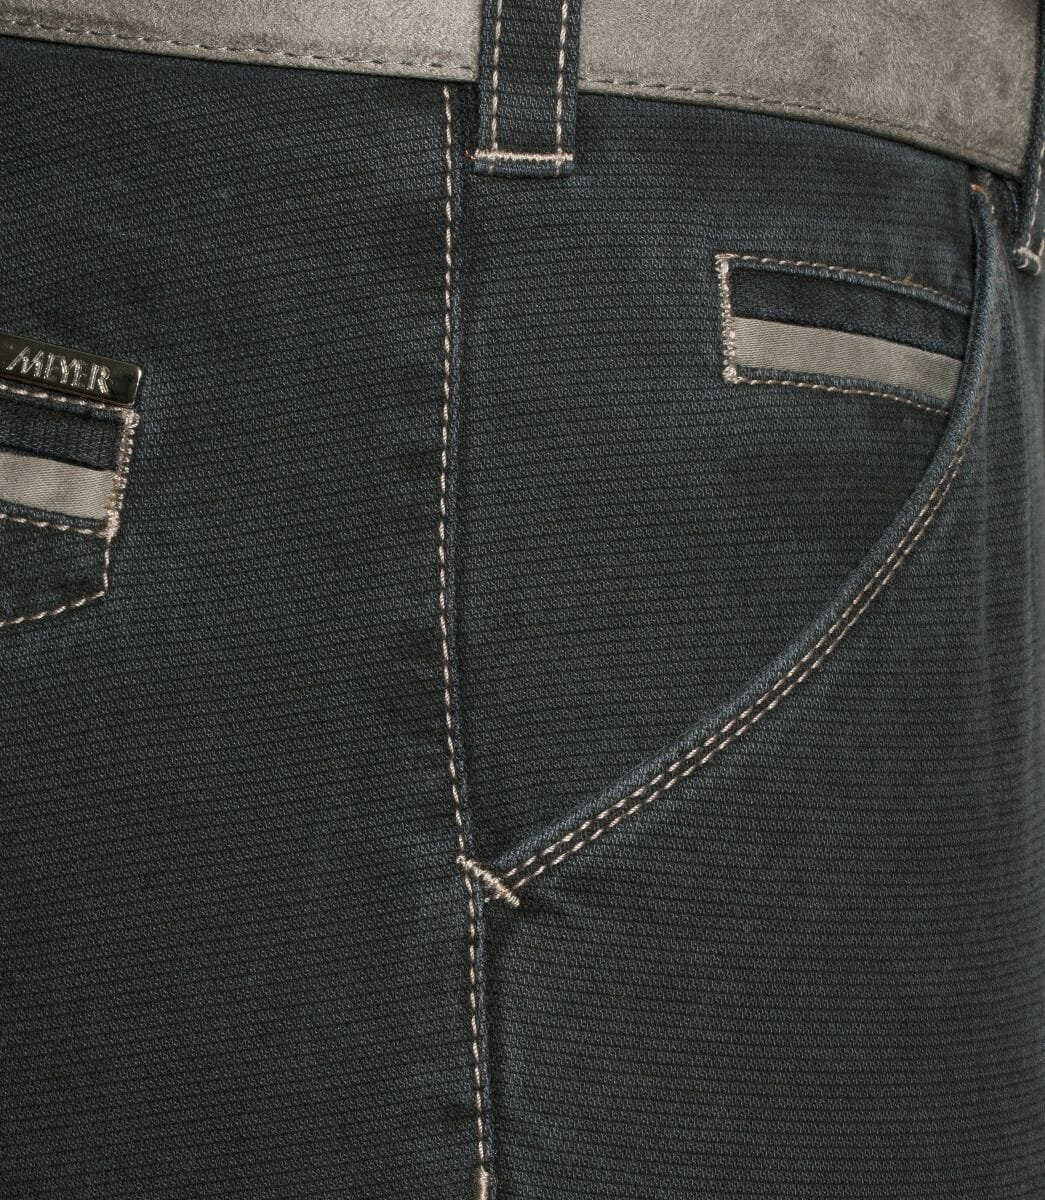 meyer hw17 chicago 5533 18 pocket detail - - Con Murphys Menswear